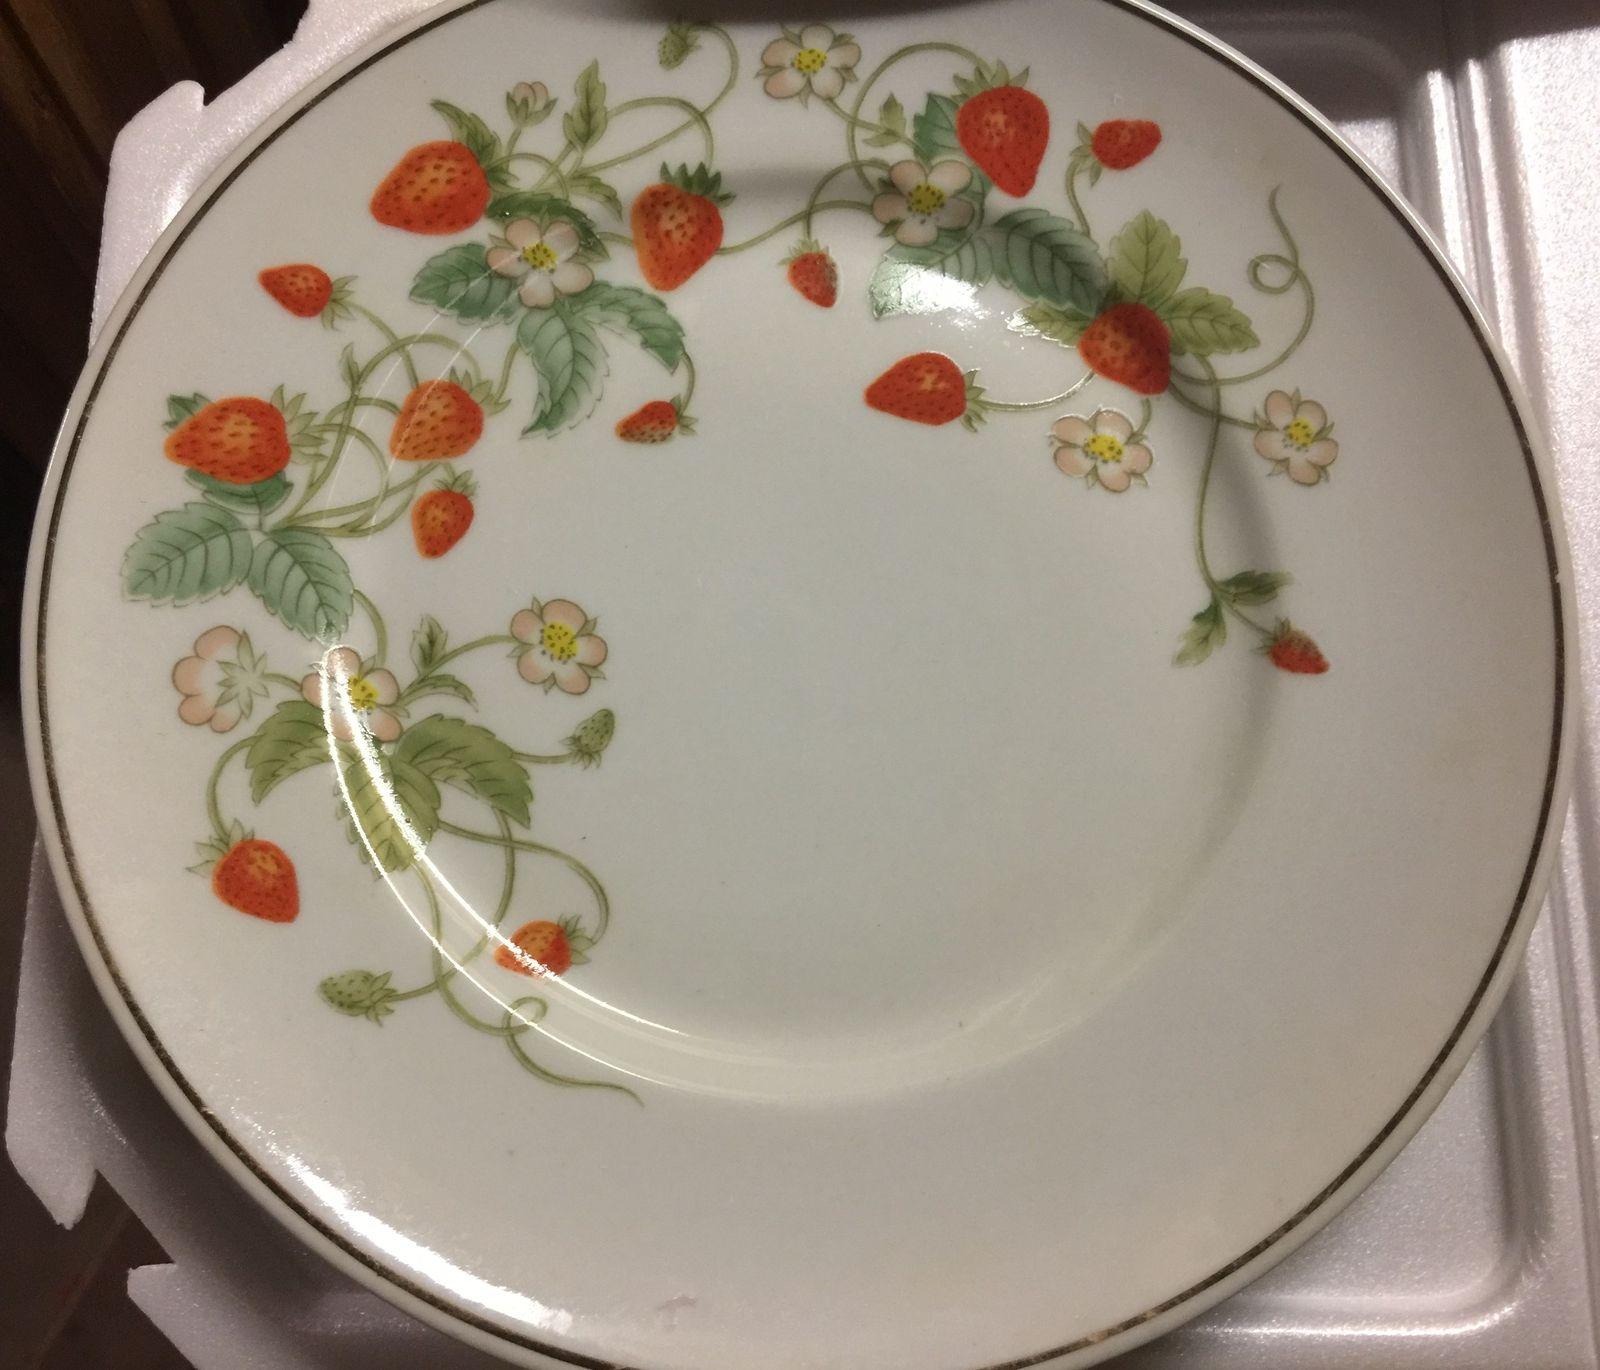 VTG 70s AVON Strawberry Porcelain 22K Gold Rimmed Collector's Plate/6 Soaps~NIB image 3